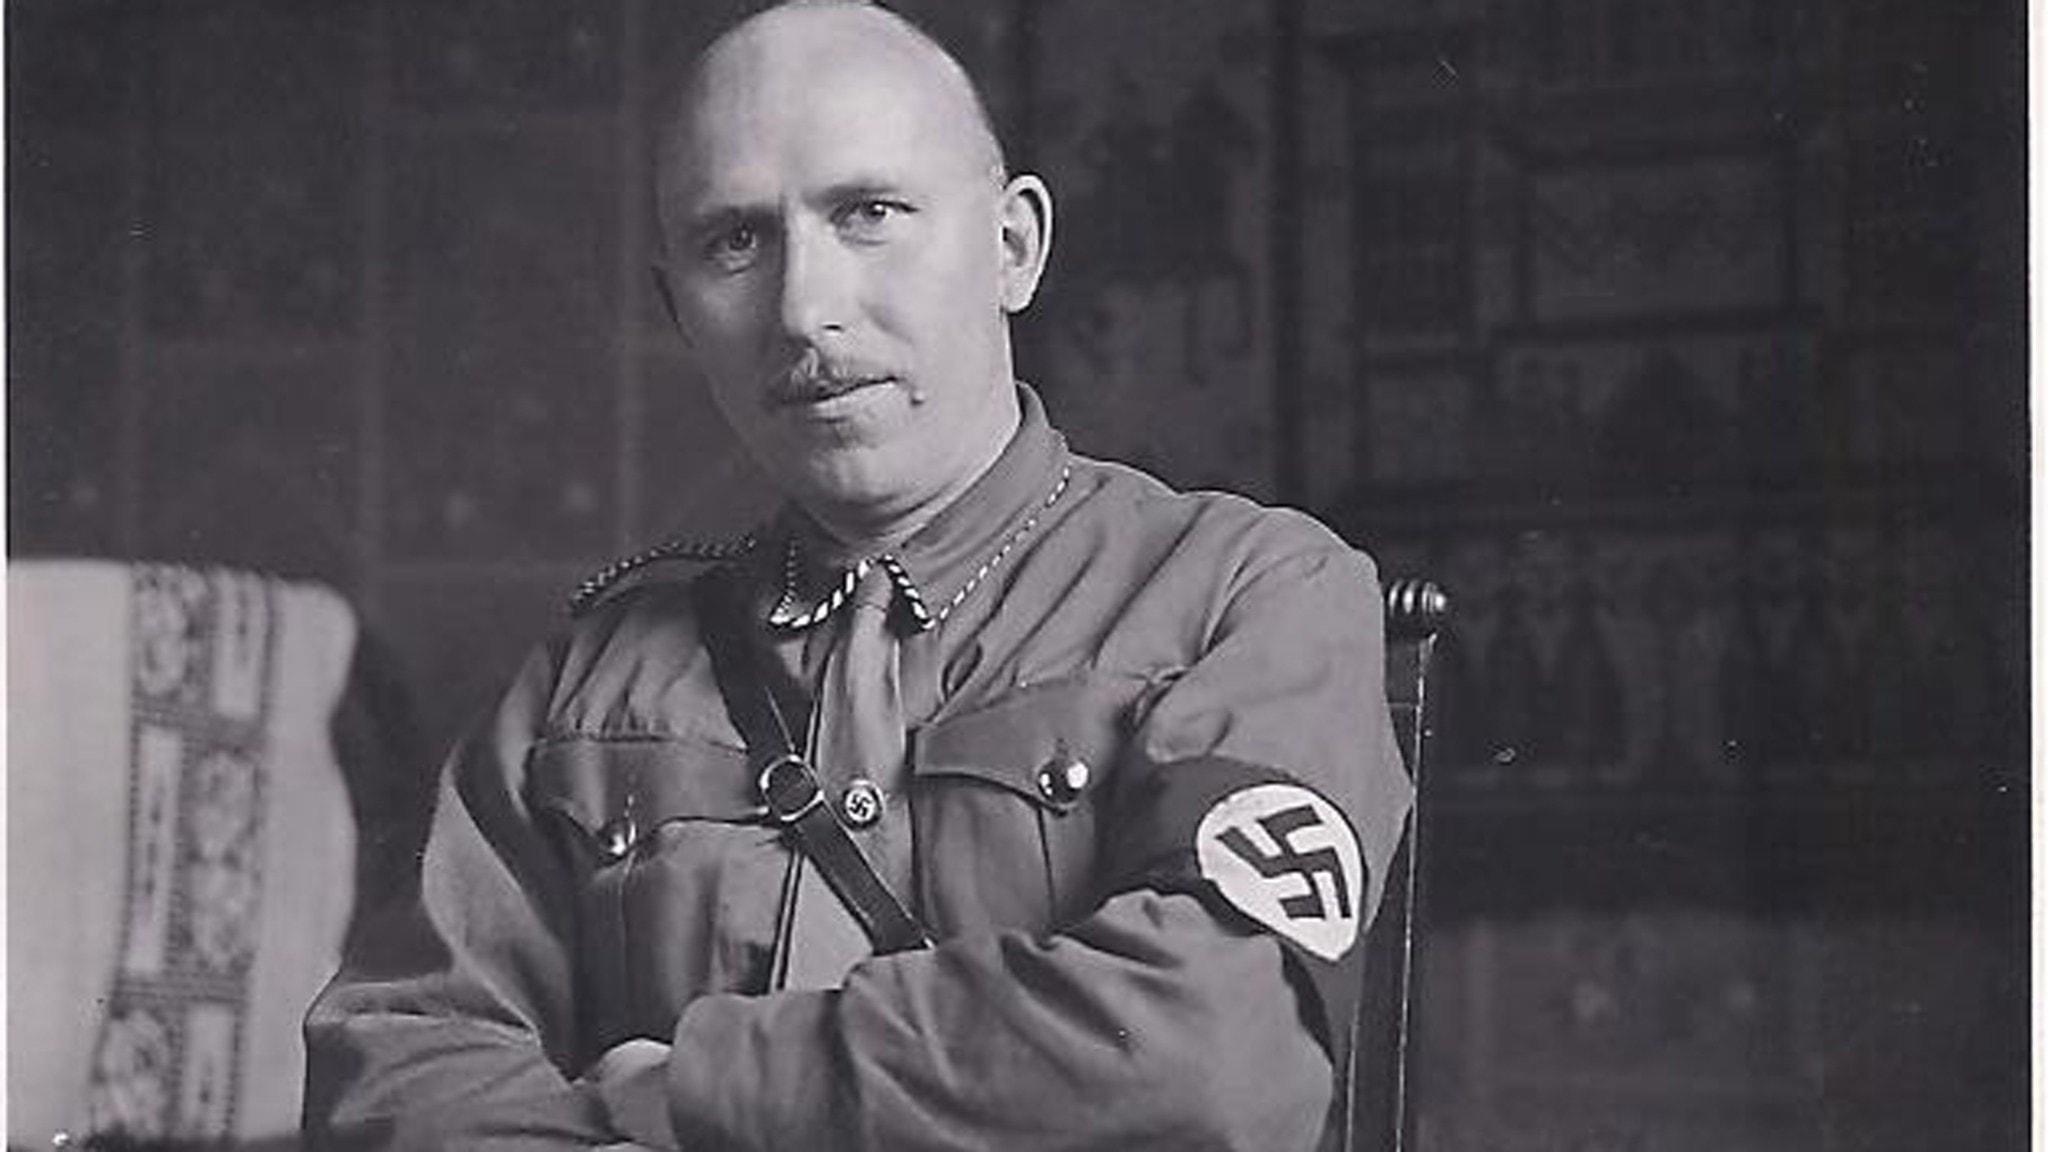 Min far var nazist